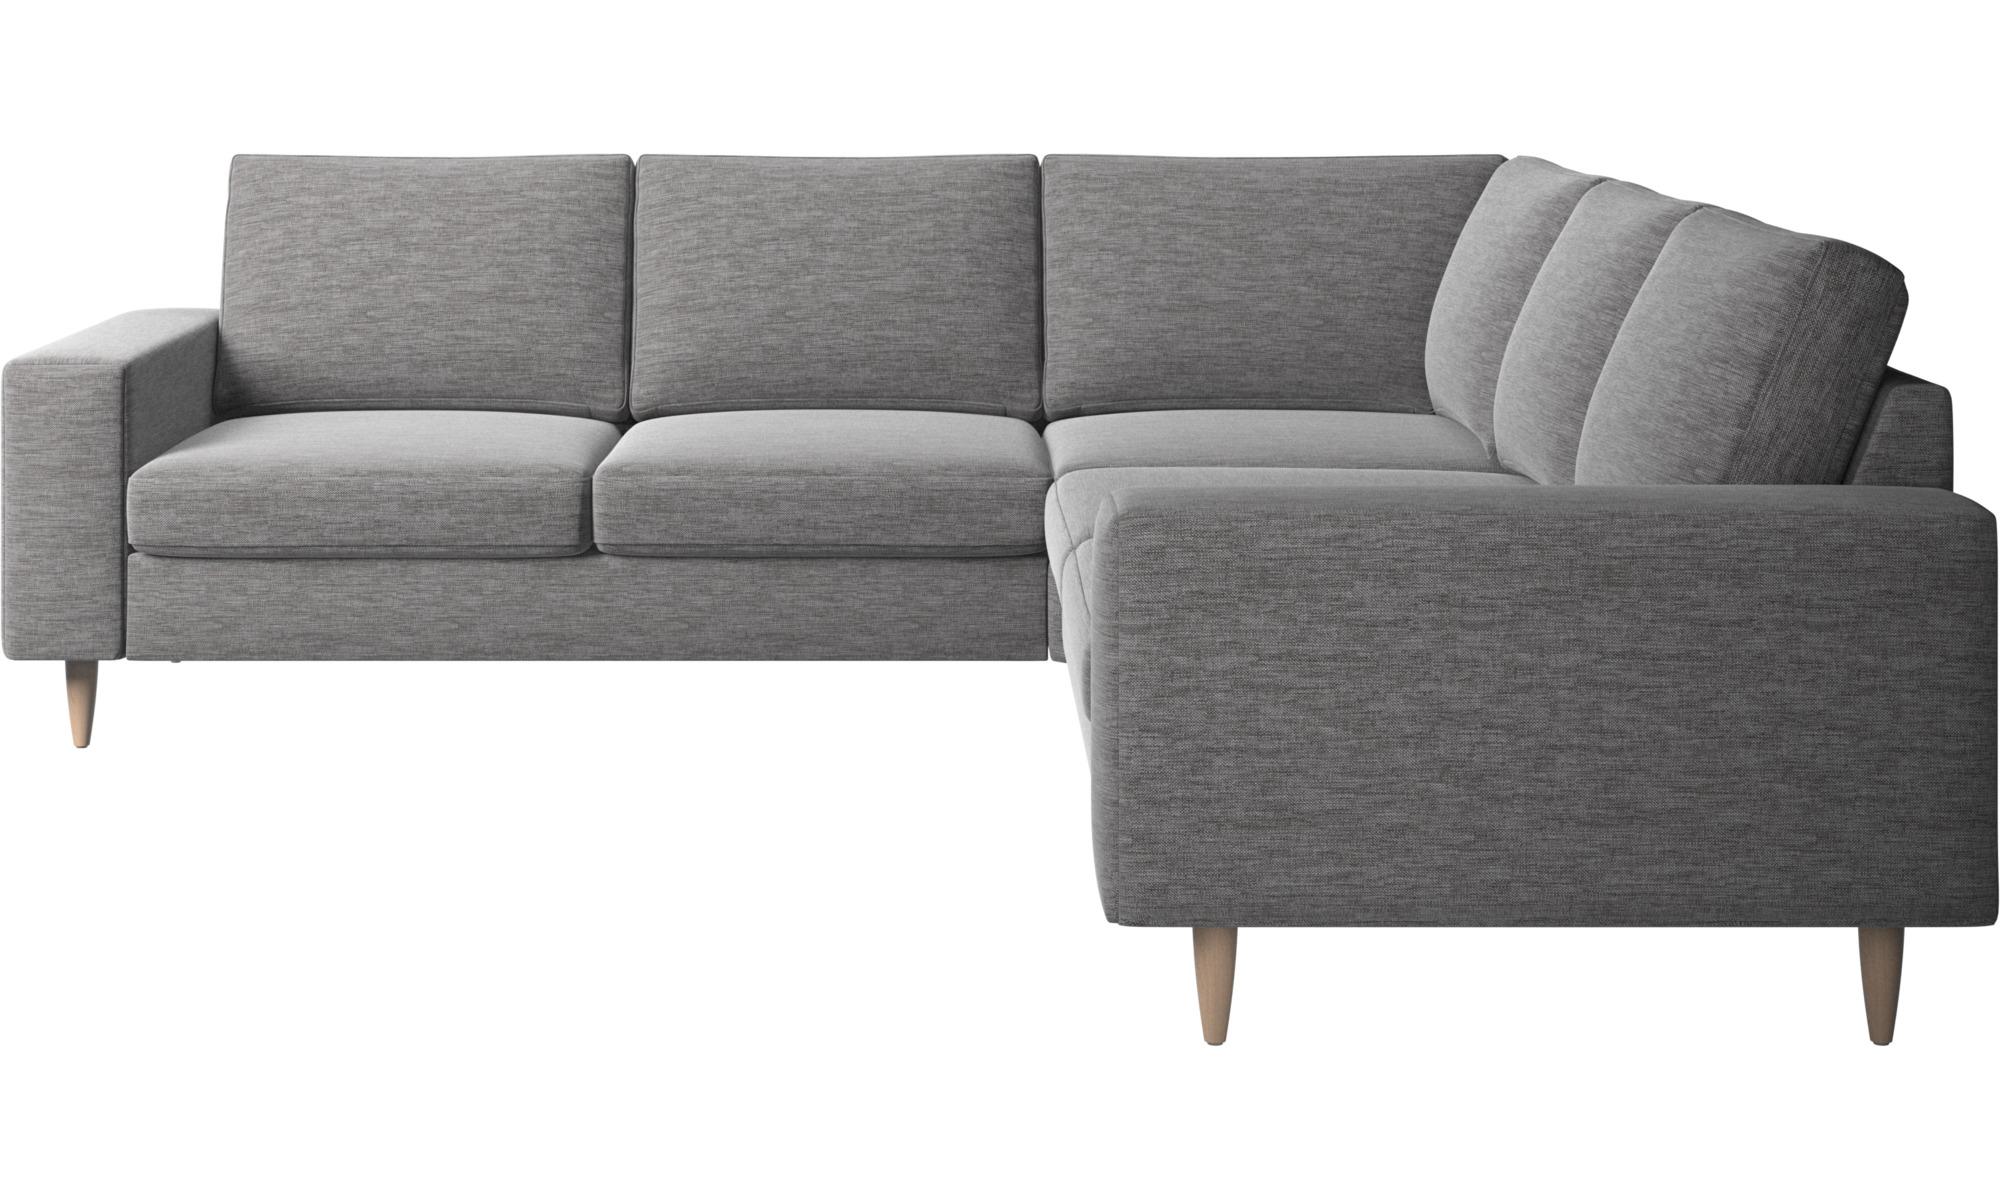 sofa indivi 2 ecksofa boconcept. Black Bedroom Furniture Sets. Home Design Ideas